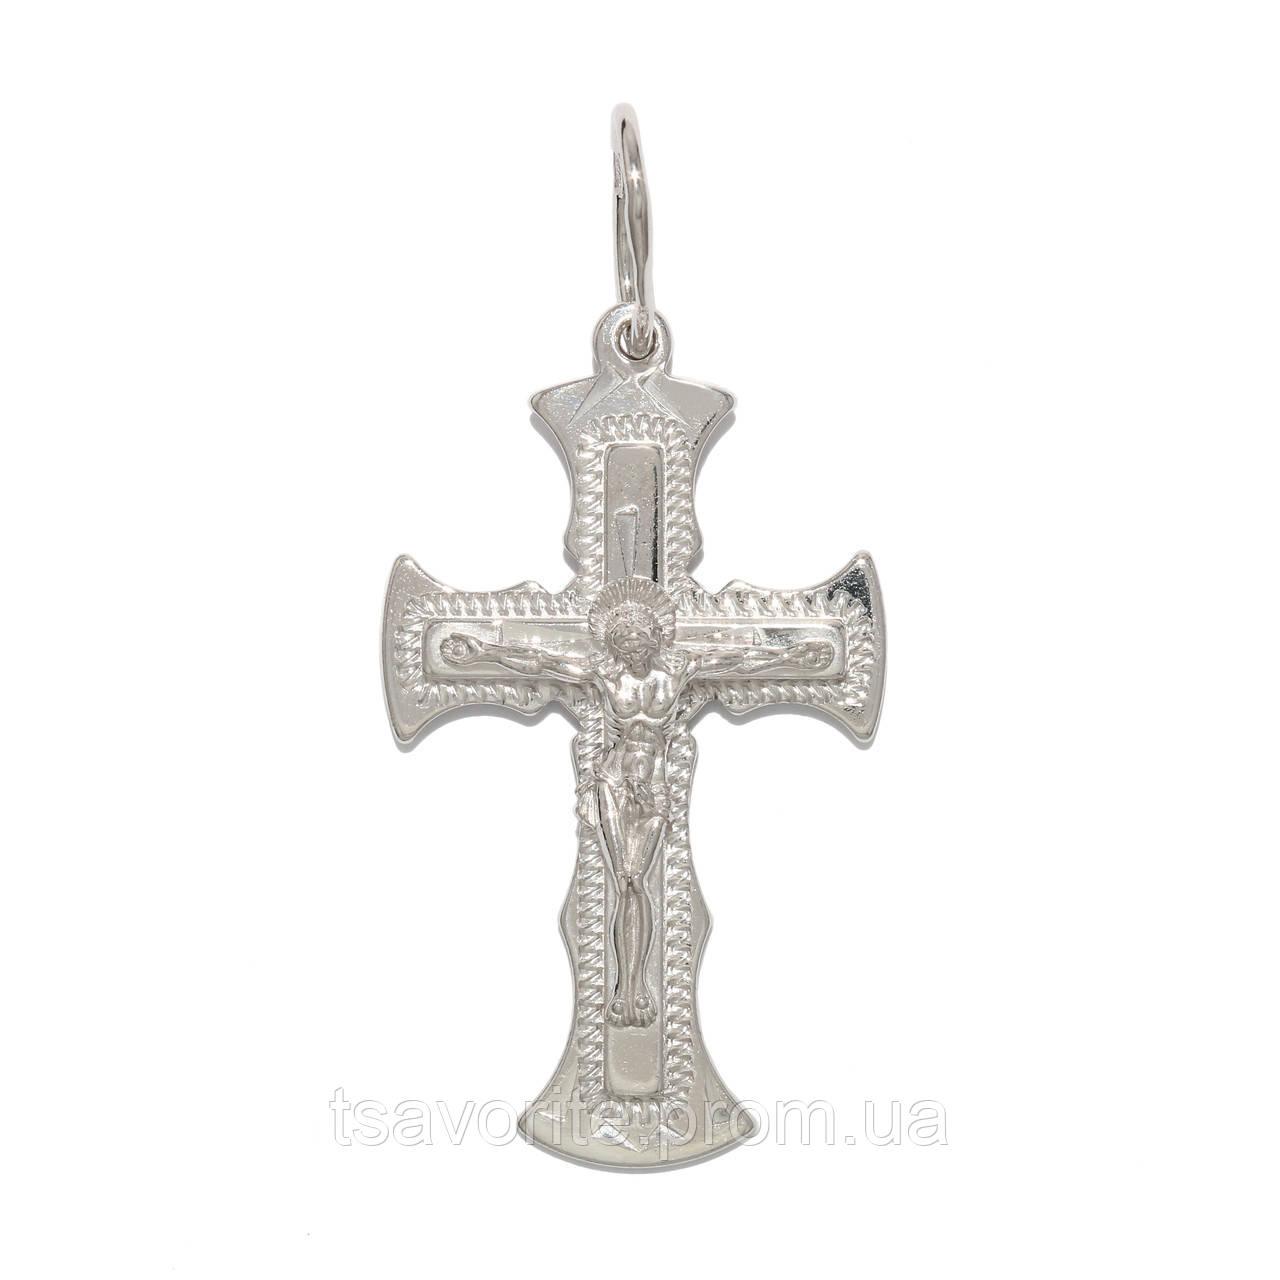 Серебряный крестик 3230-Р